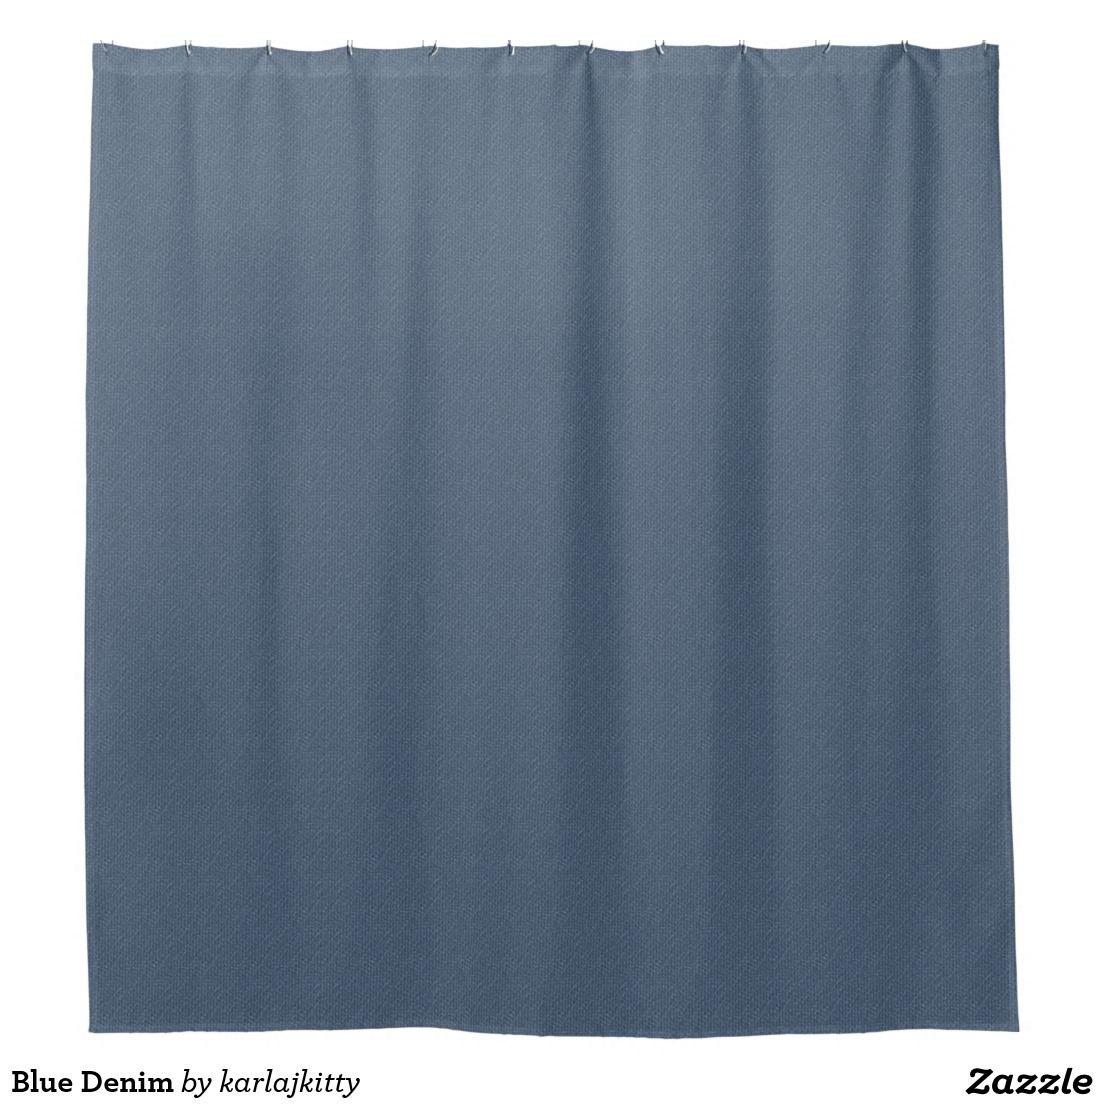 Blue Denim Shower Curtain Zazzle Com With Images Trendy